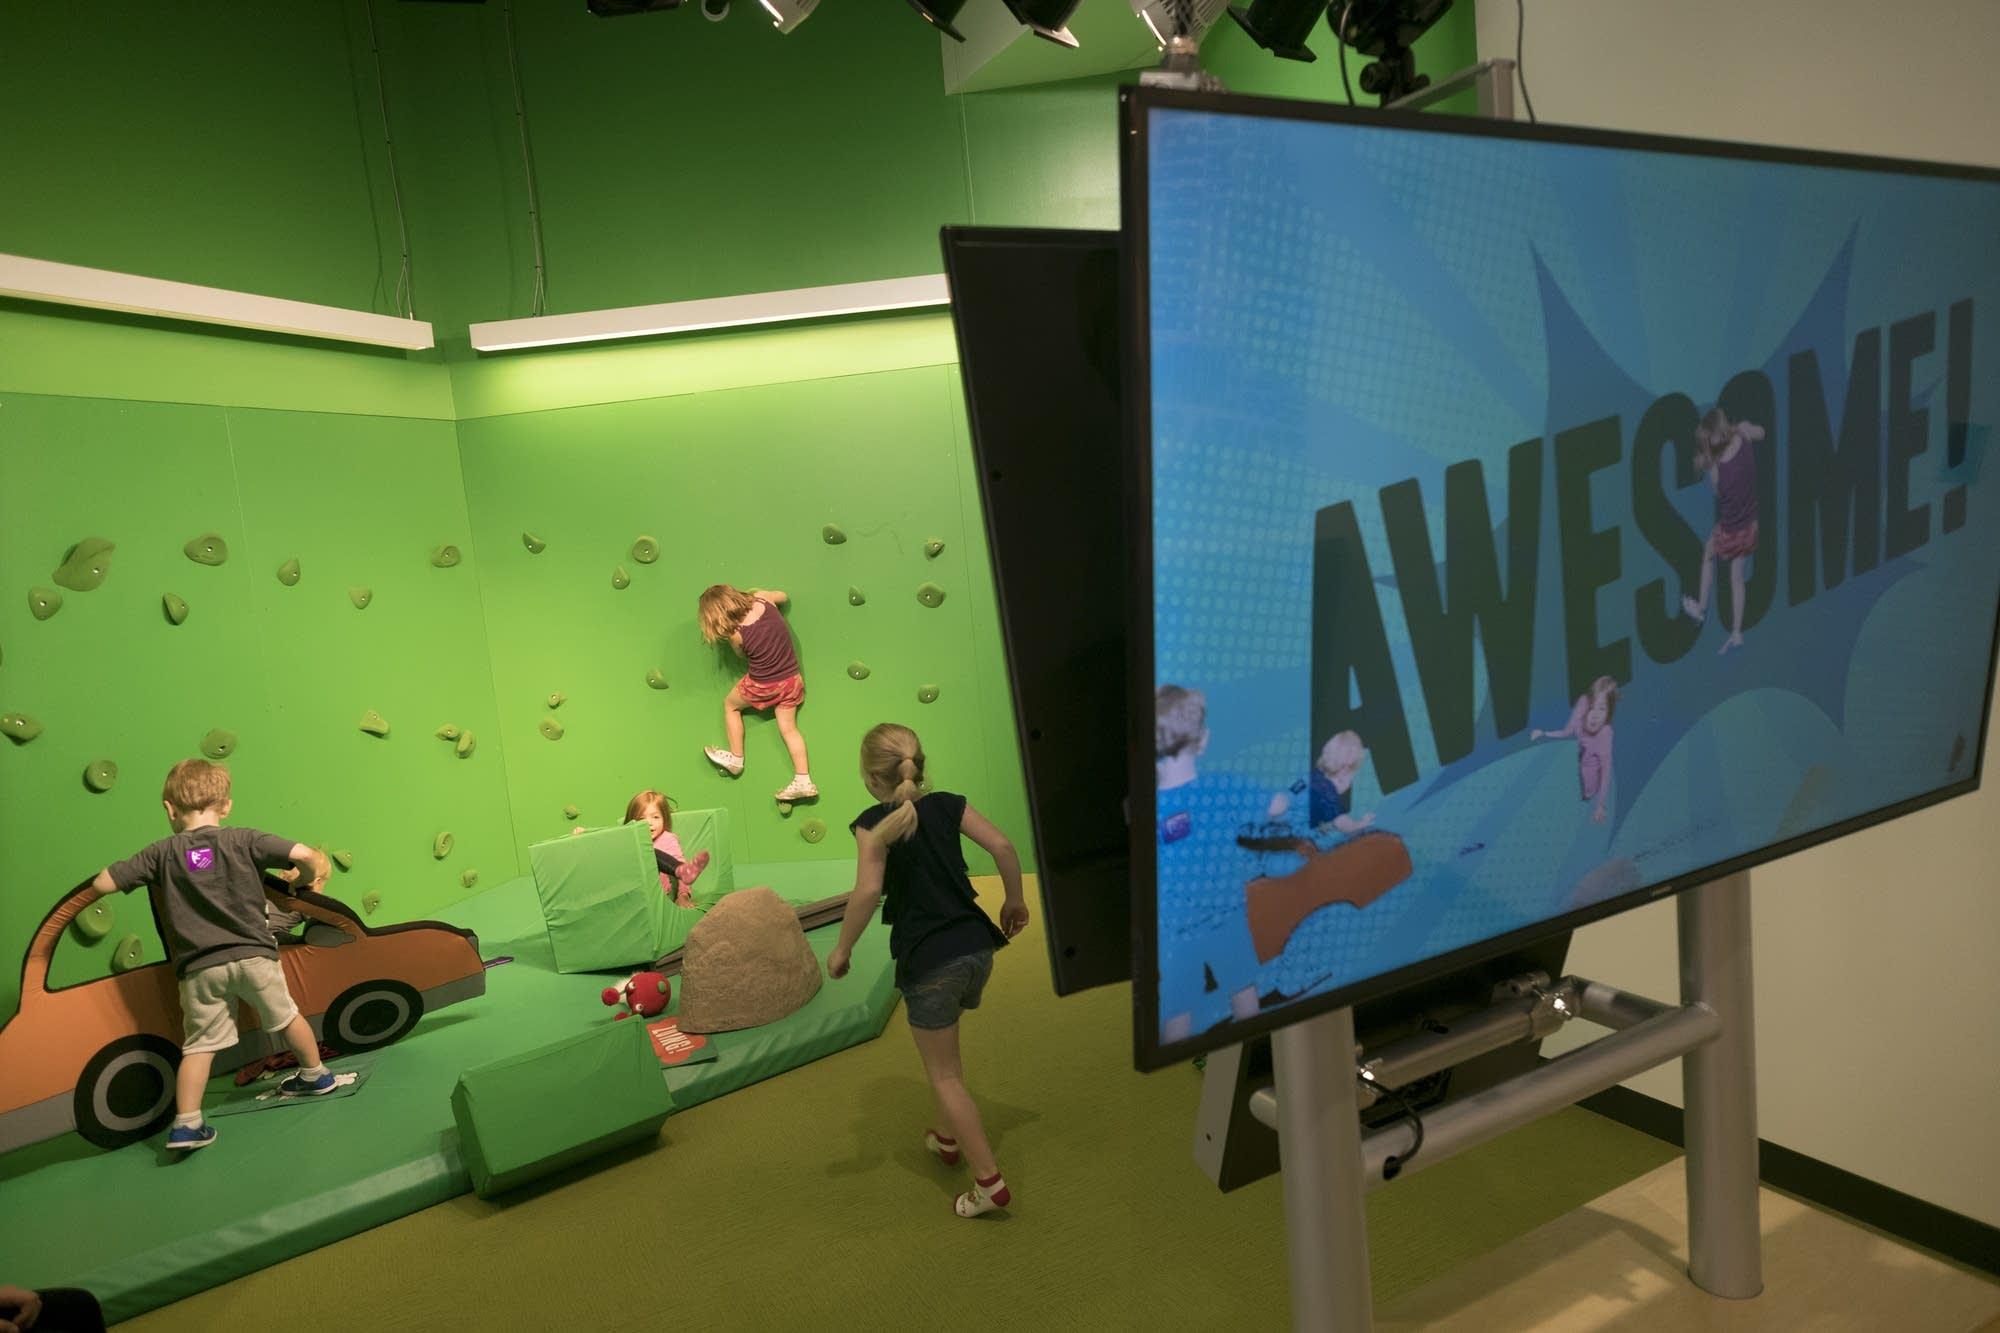 Kids climb on a green screen.